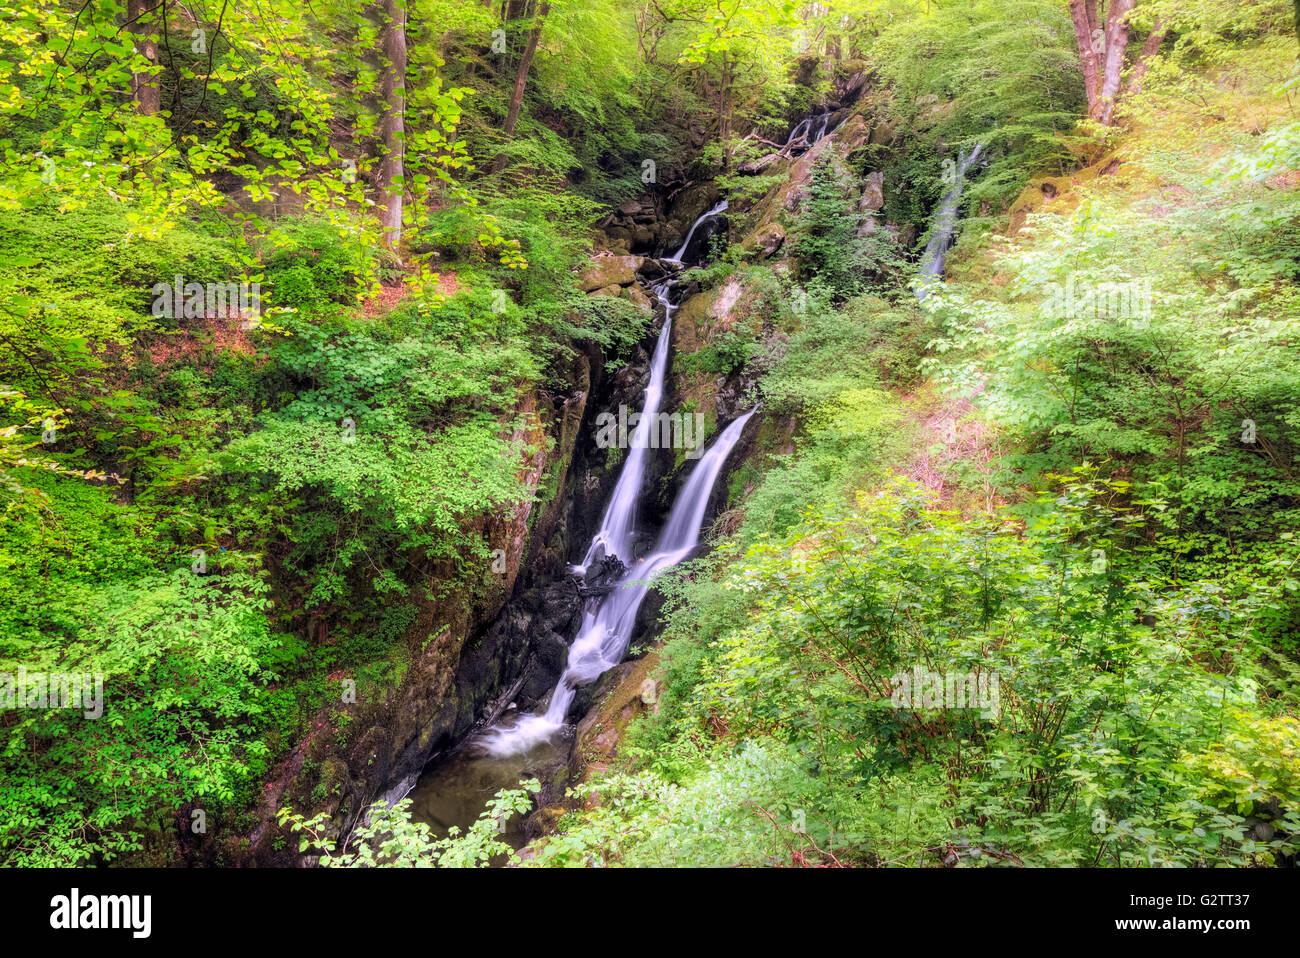 Ambleside, Stock Ghyll Force, Lake District, Cumbria, England, UK - Stock Image